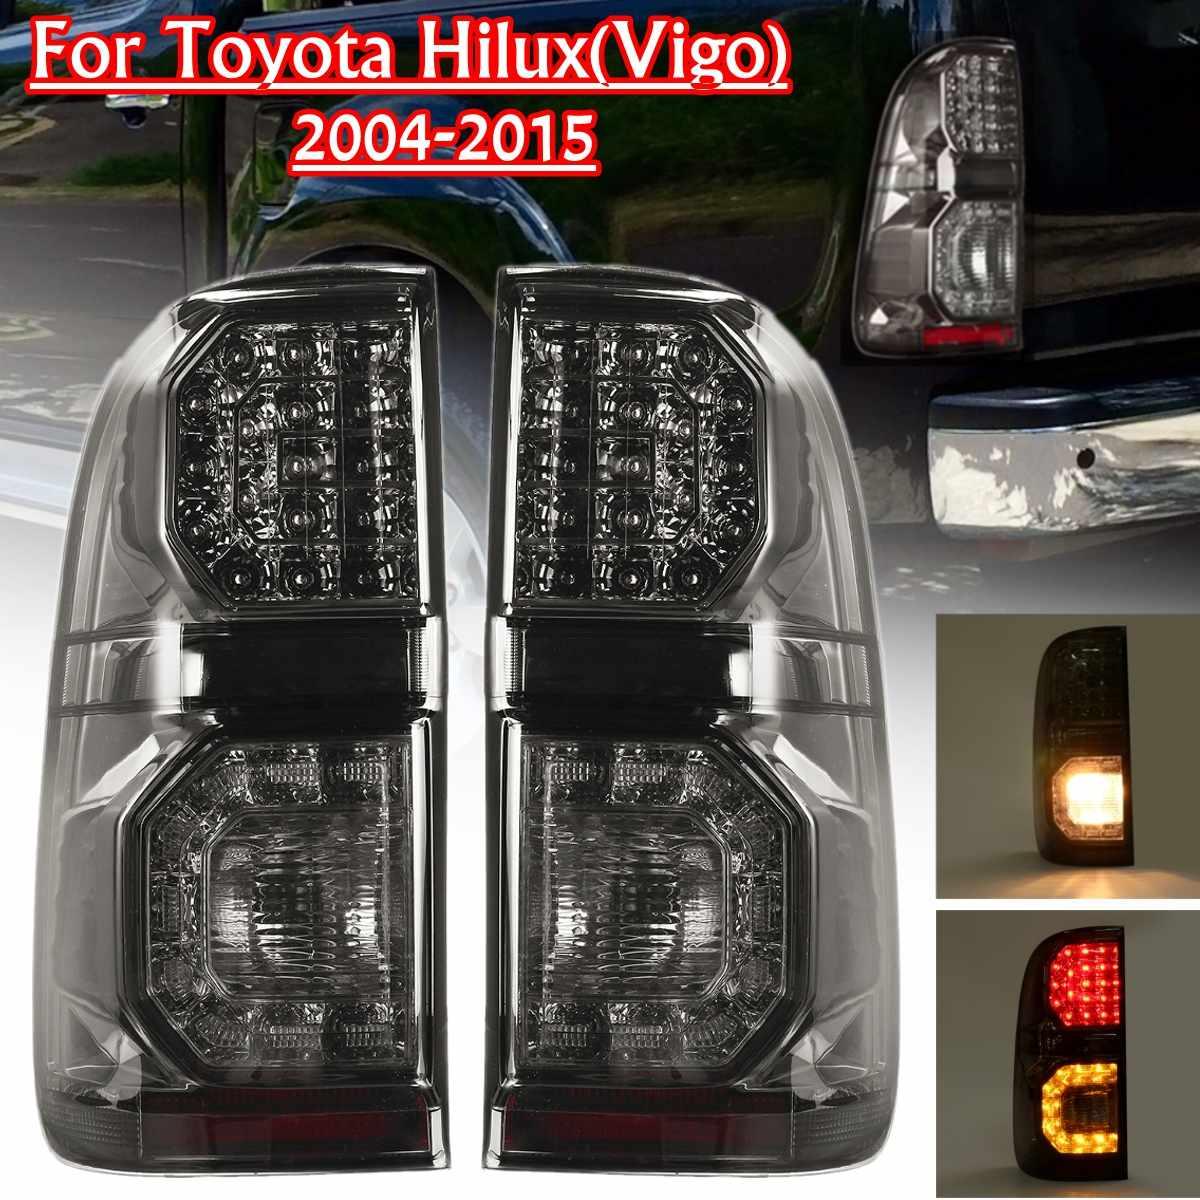 Luz Led trasera de coche para Toyota Hilux Vigo KUN26 SR SR5 Workmate 2004-2015 luz trasera freno trasero luz antiniebla accesorios Led